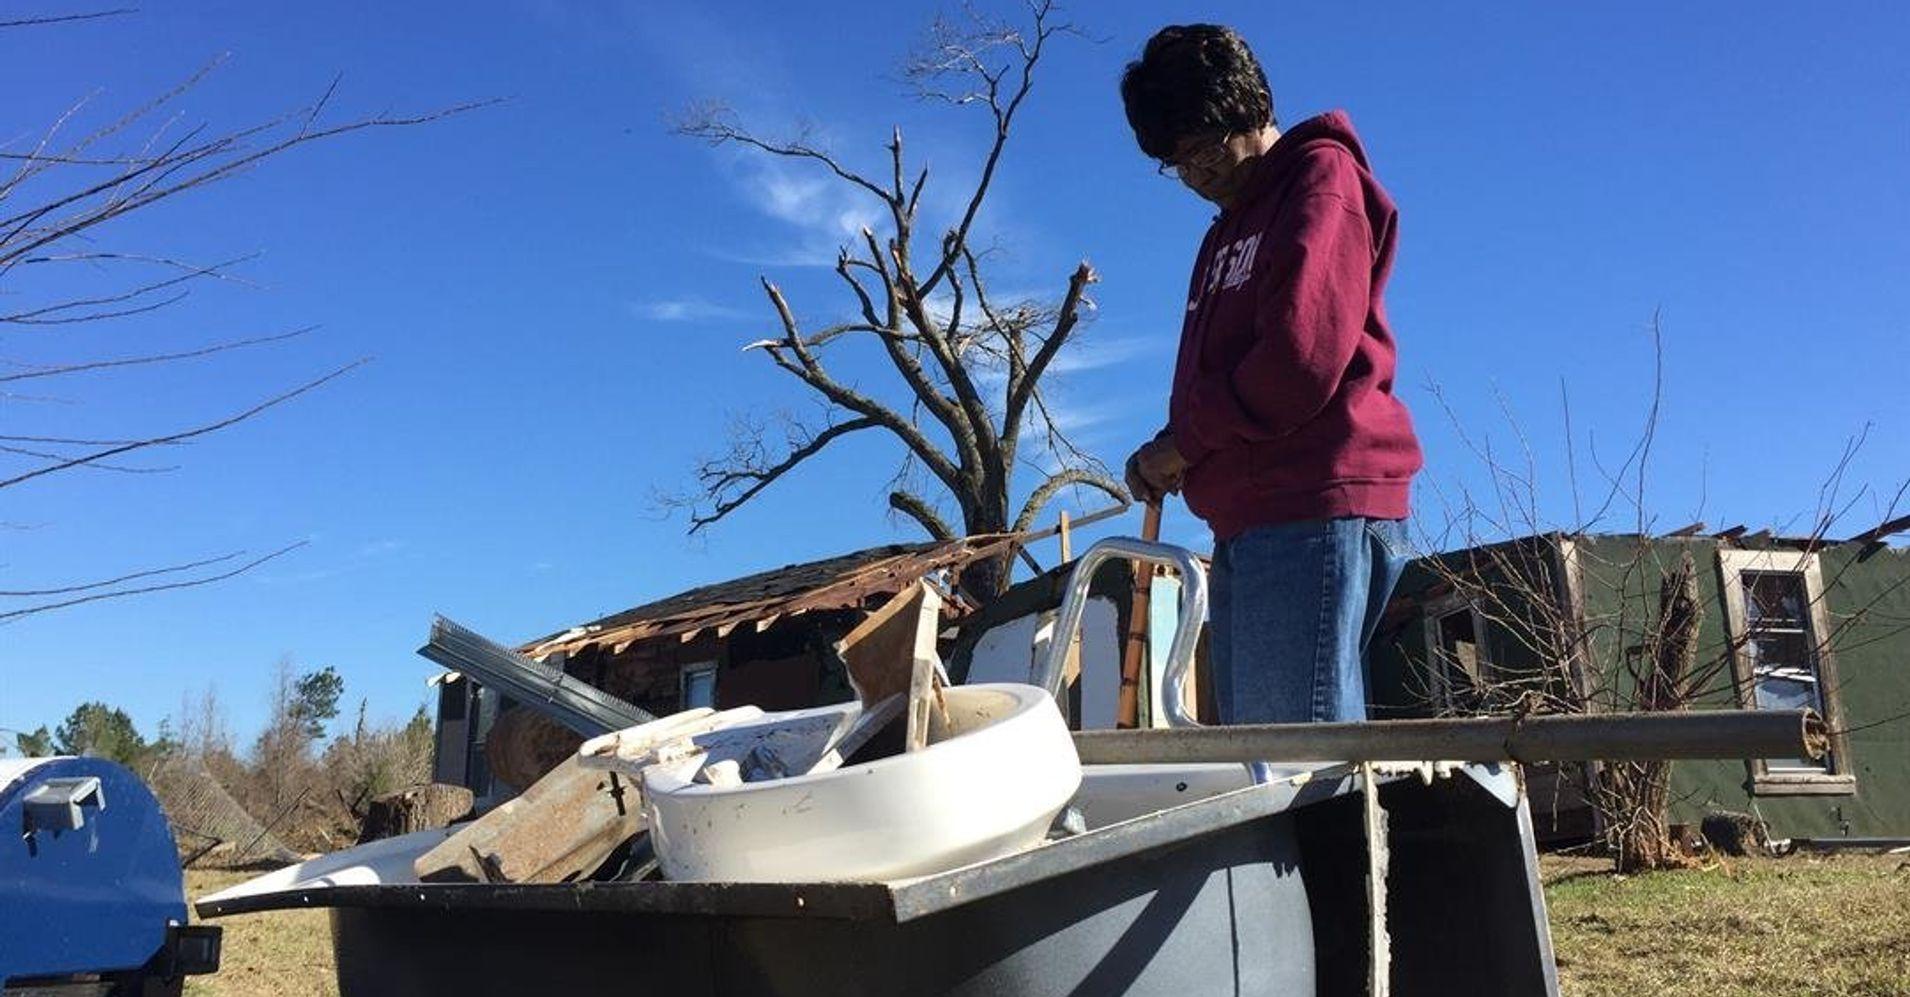 75-Year-Old Woman Survives Wild Tornado Bathtub Ride   HuffPost